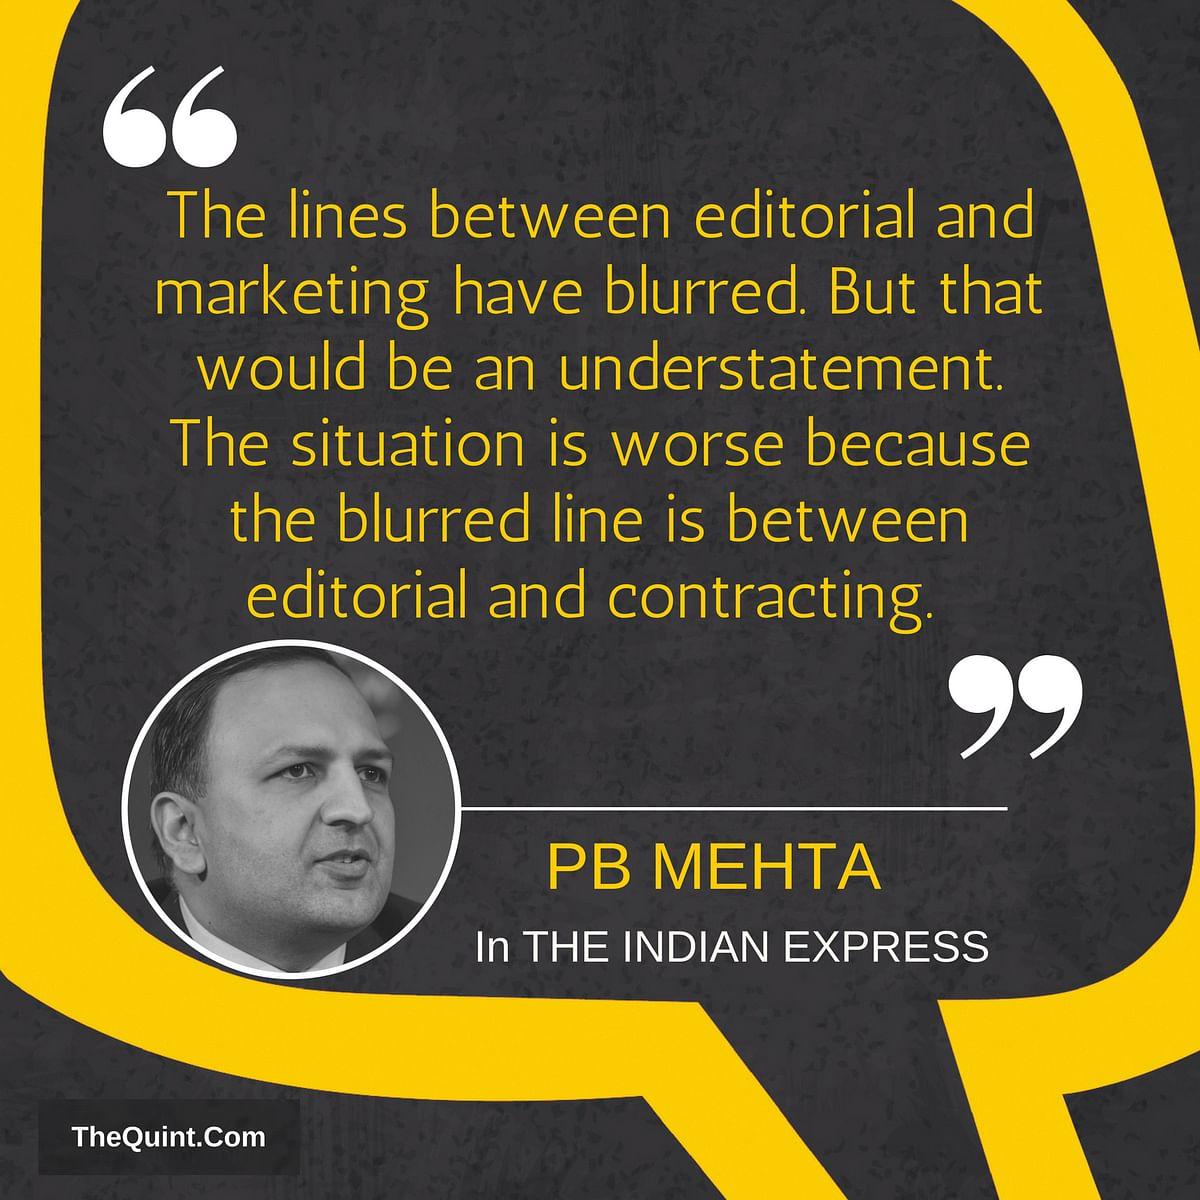 Cobrapost Op Shows Media's Disrespect For People, Writes PB Mehta